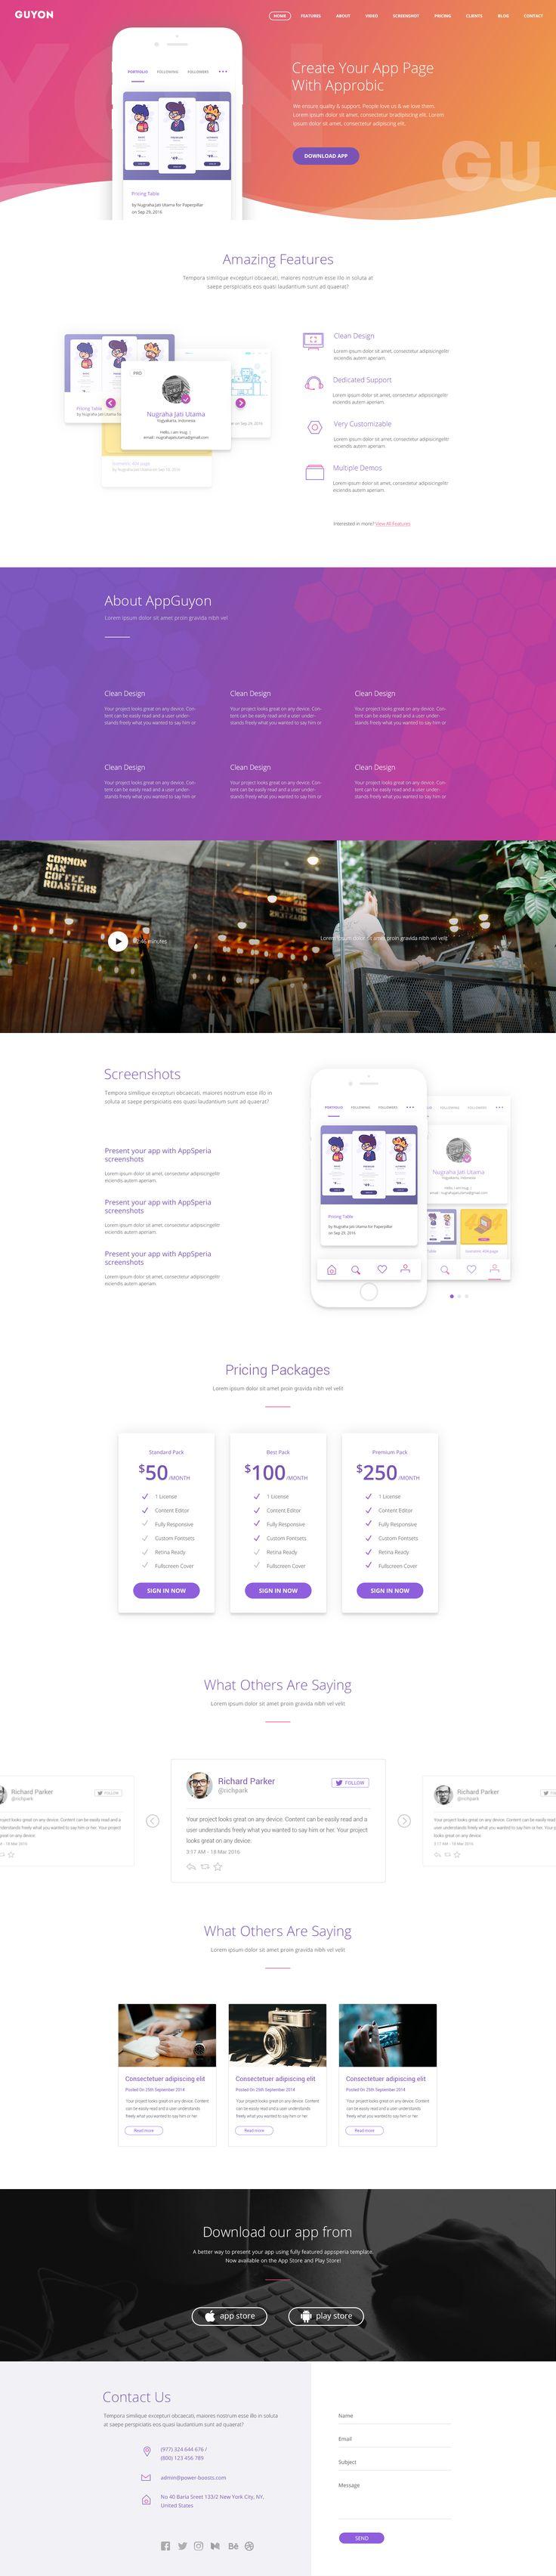 49 best landing page images on Pinterest | Website designs, Web ...